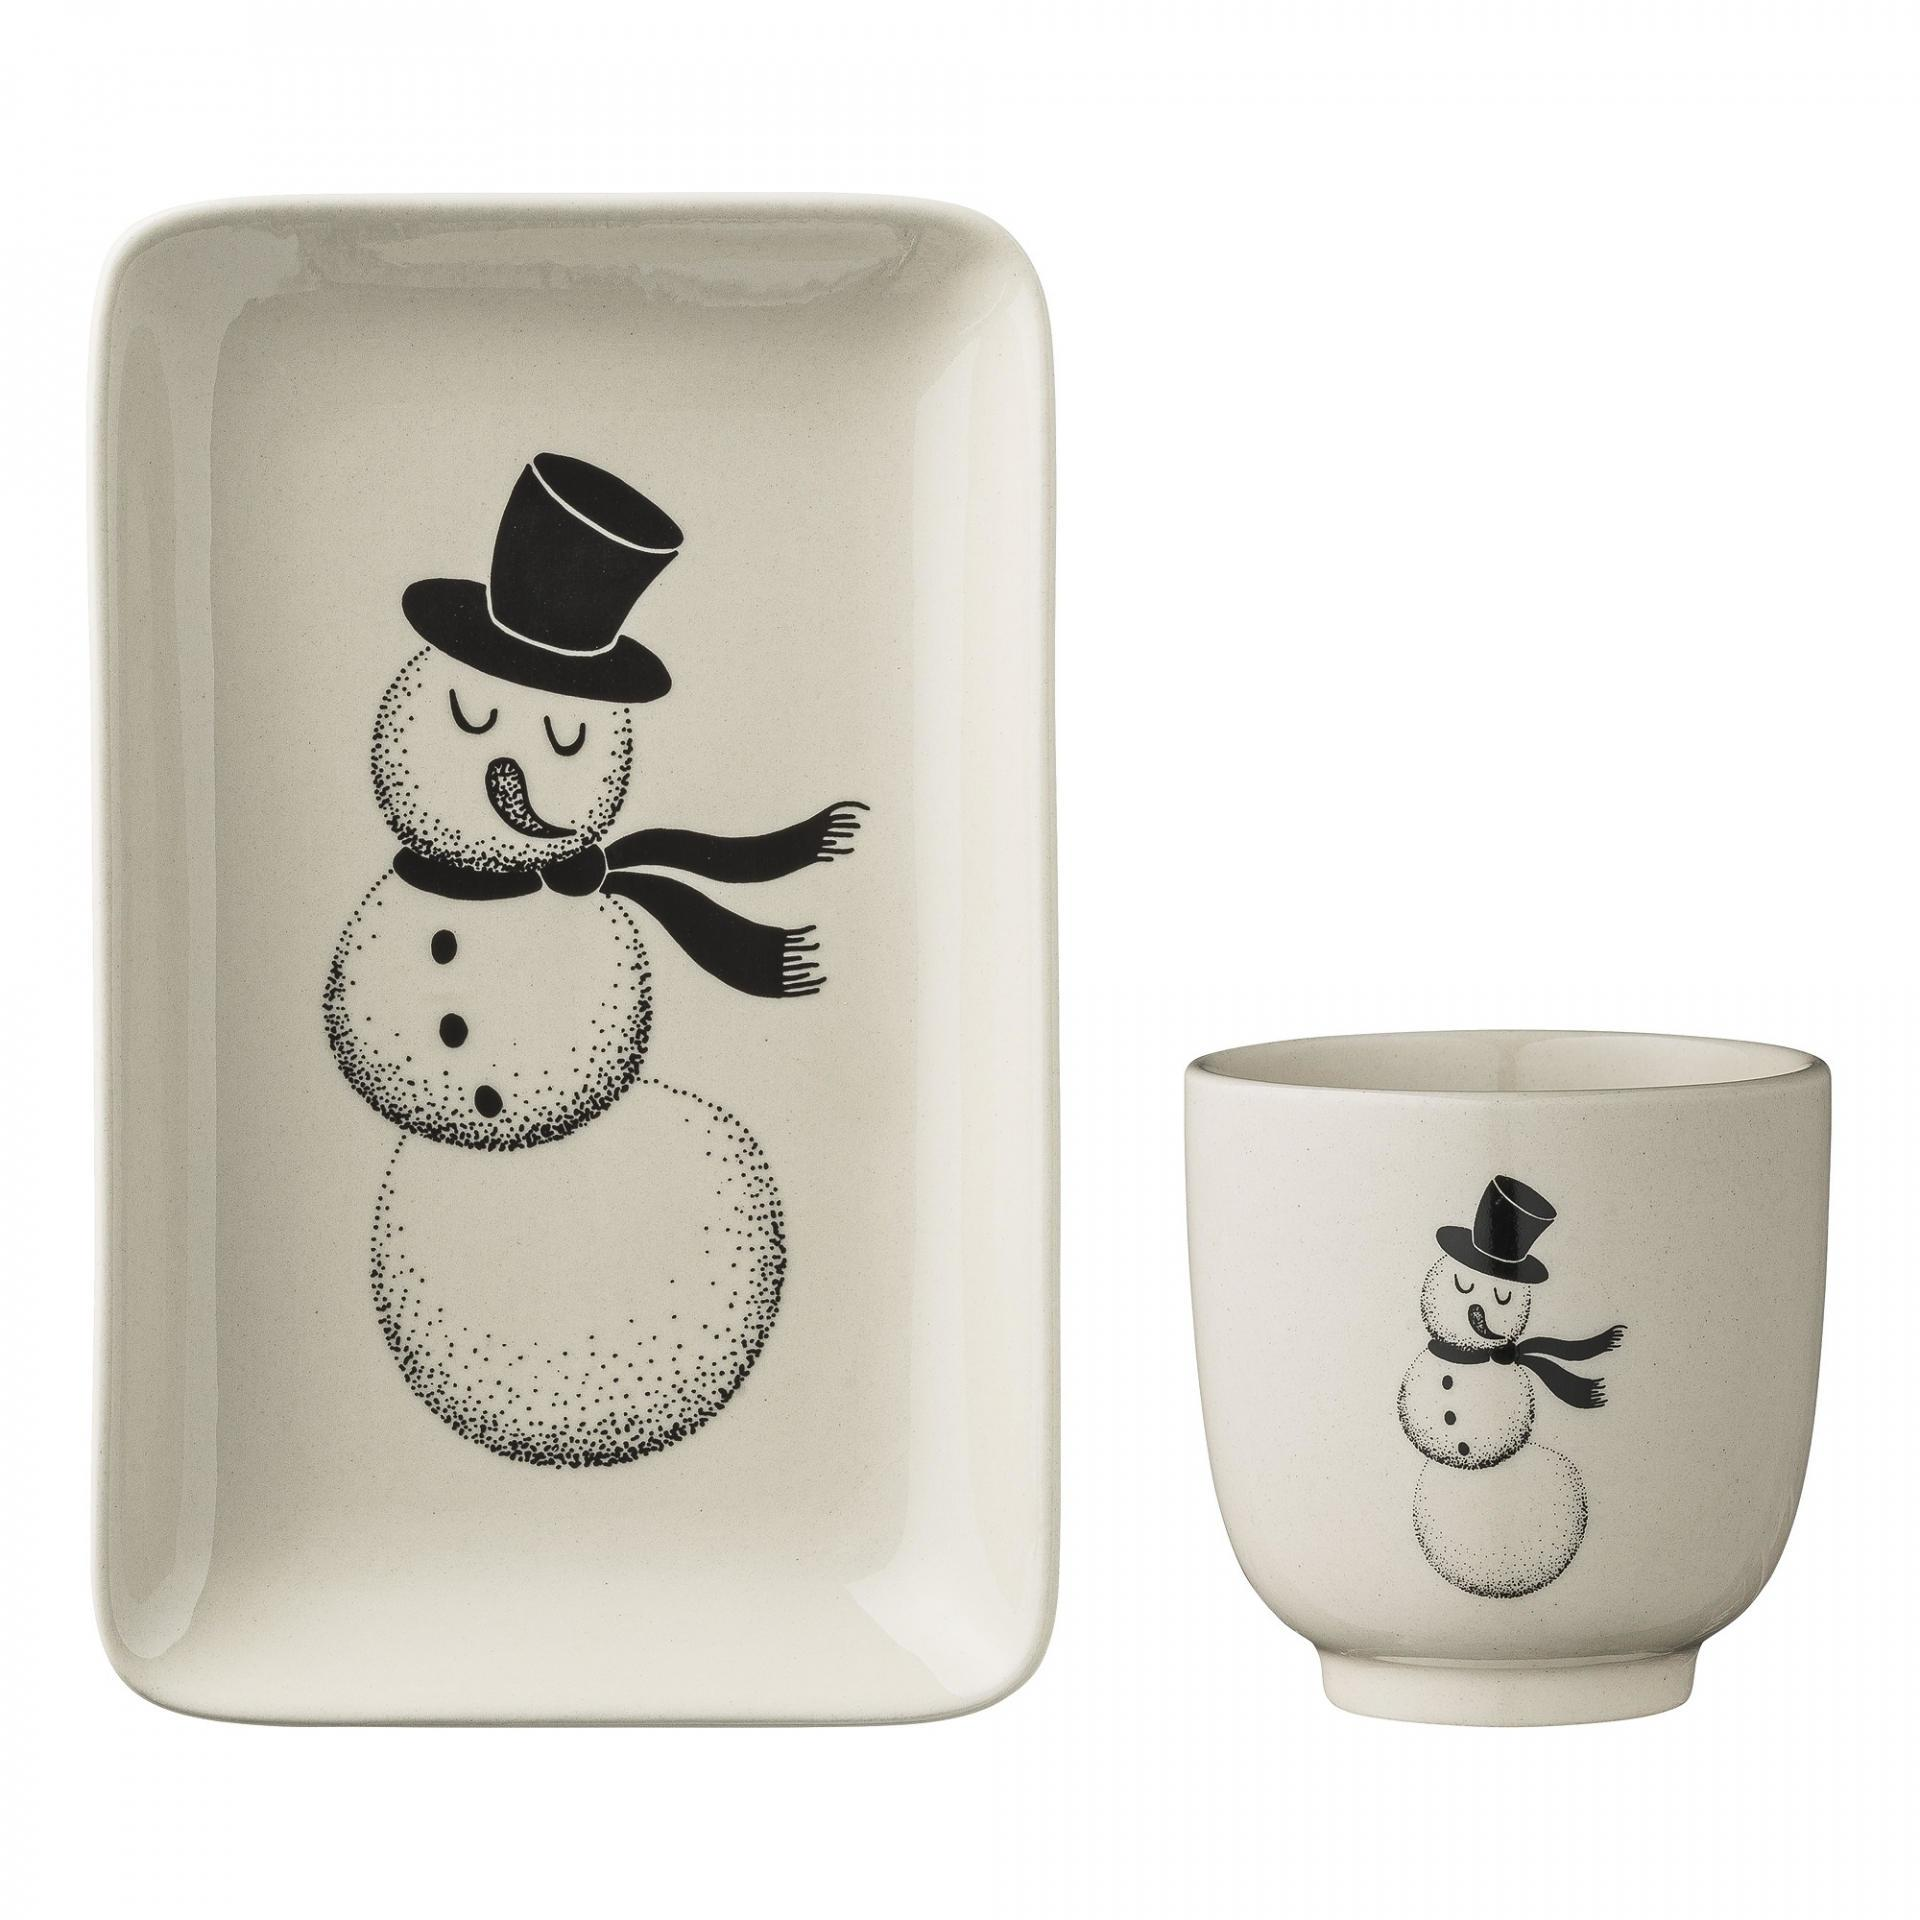 Bloomingville Tácek s kalíškem pro děti Snowman - set 2 ks, černá barva, bílá barva, keramika